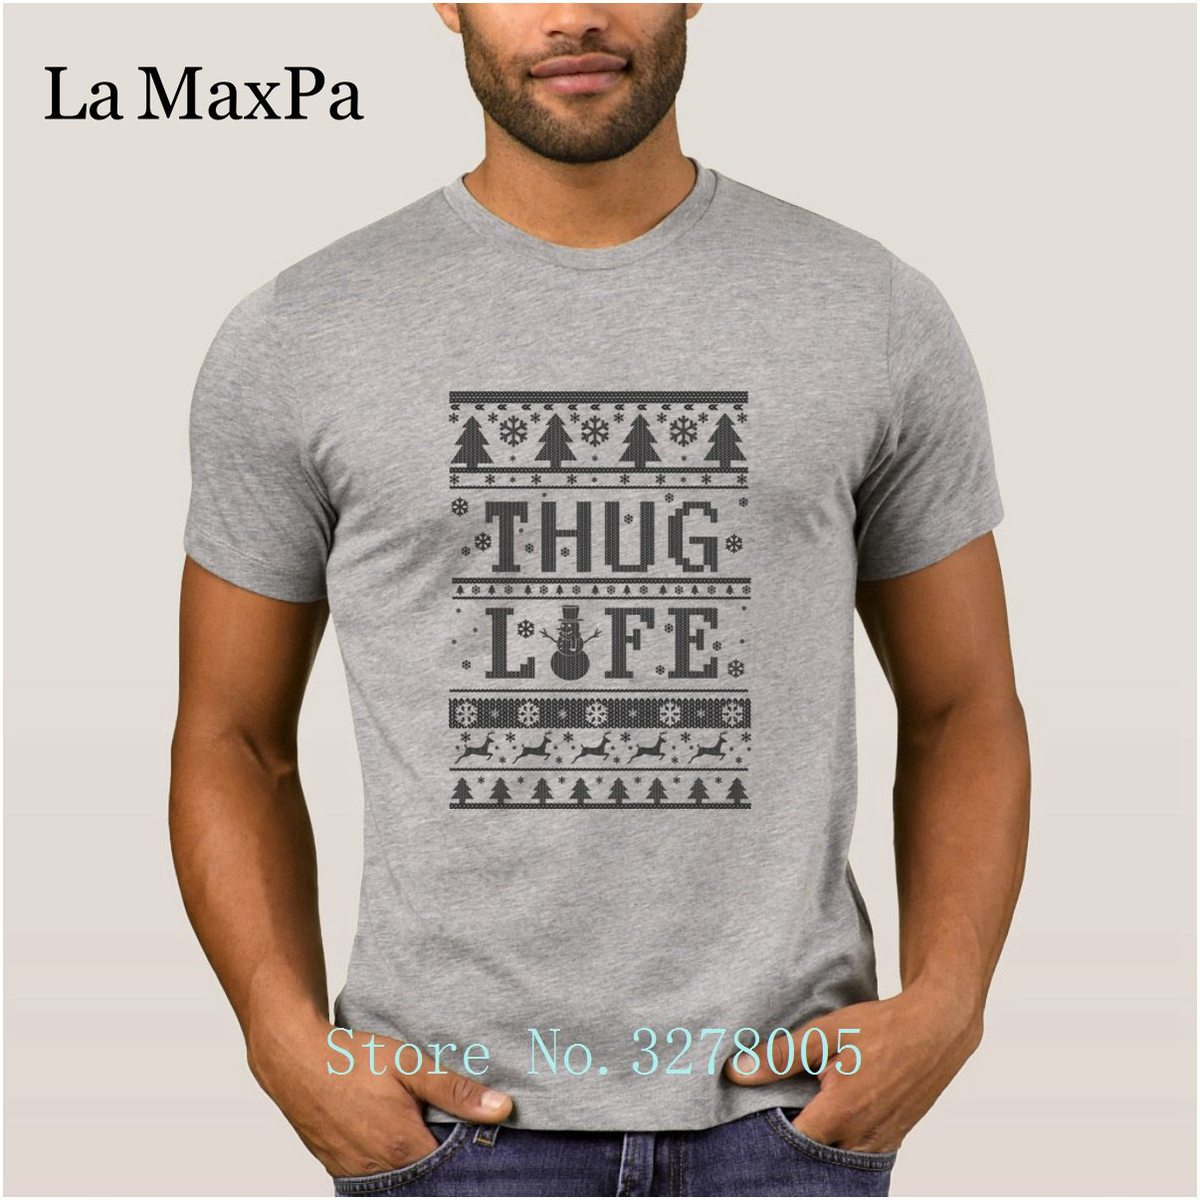 Brand La Maxpa Comical Thug Life Ugly Christmas T Shirts Men Anti-Wrinkle Men T-Shirt Adult Size S-3xl Tee Shirt Men Cheap Sale